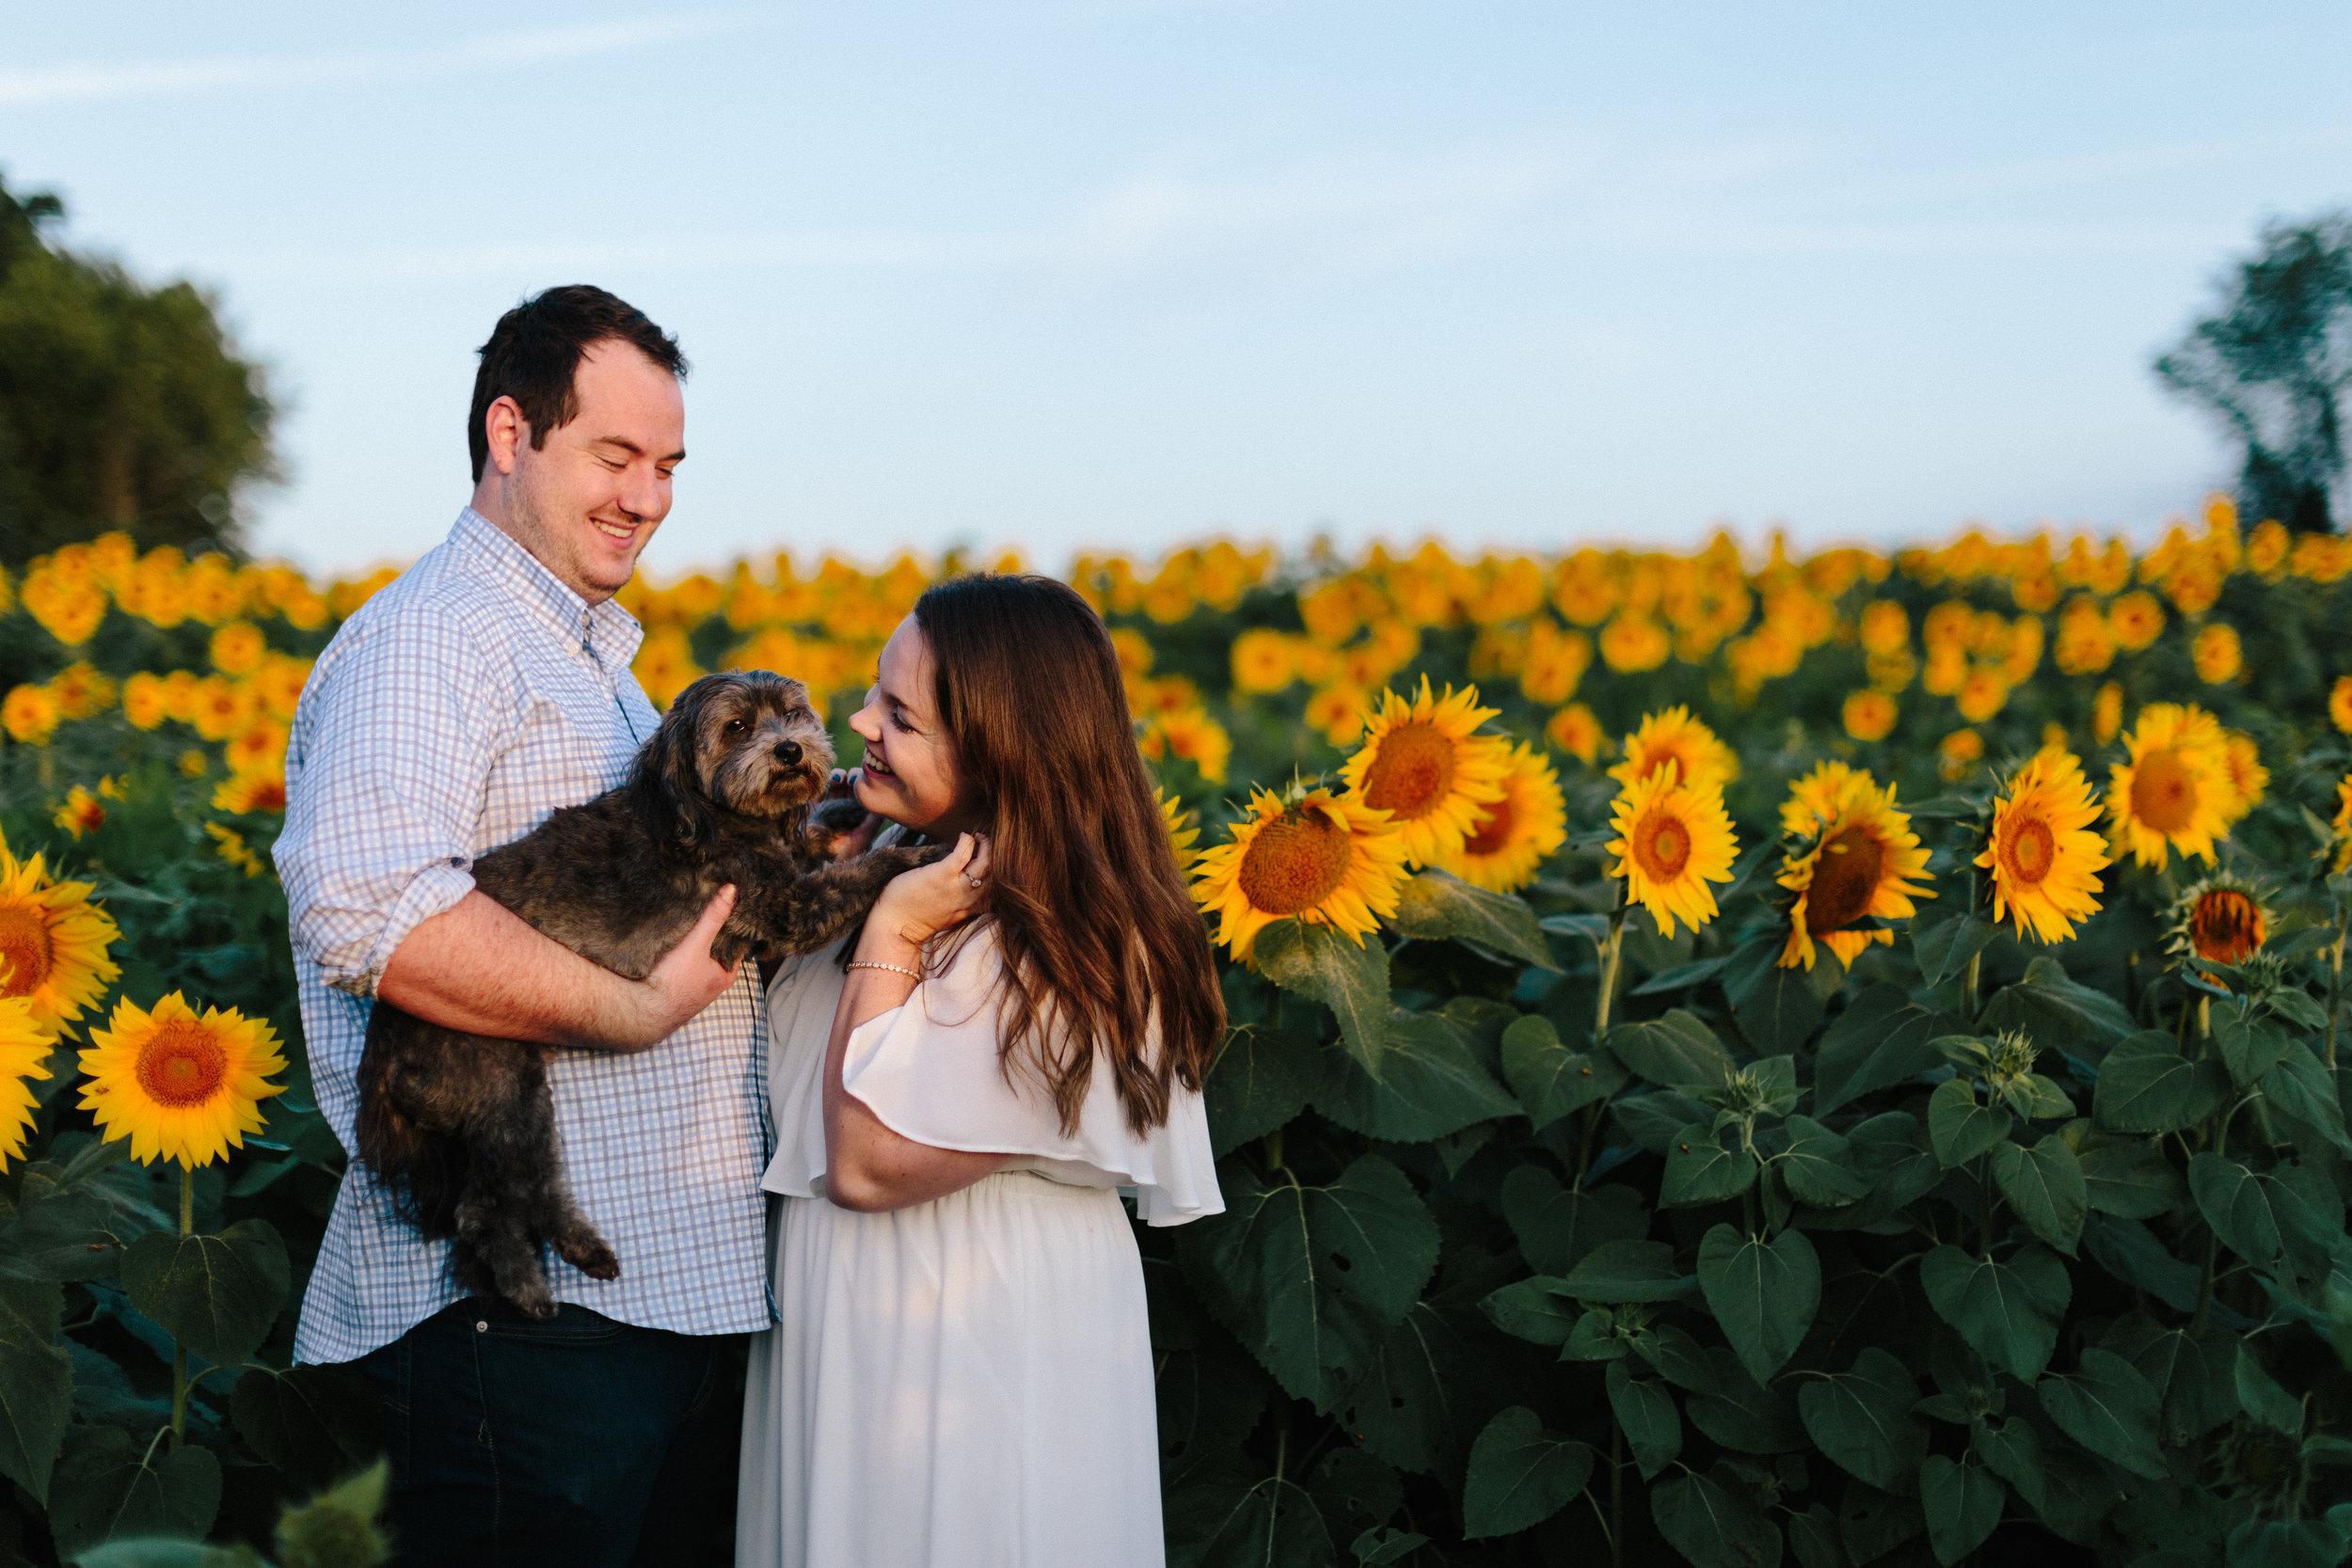 alyssa barletter photography sunflower field photos-2.jpg